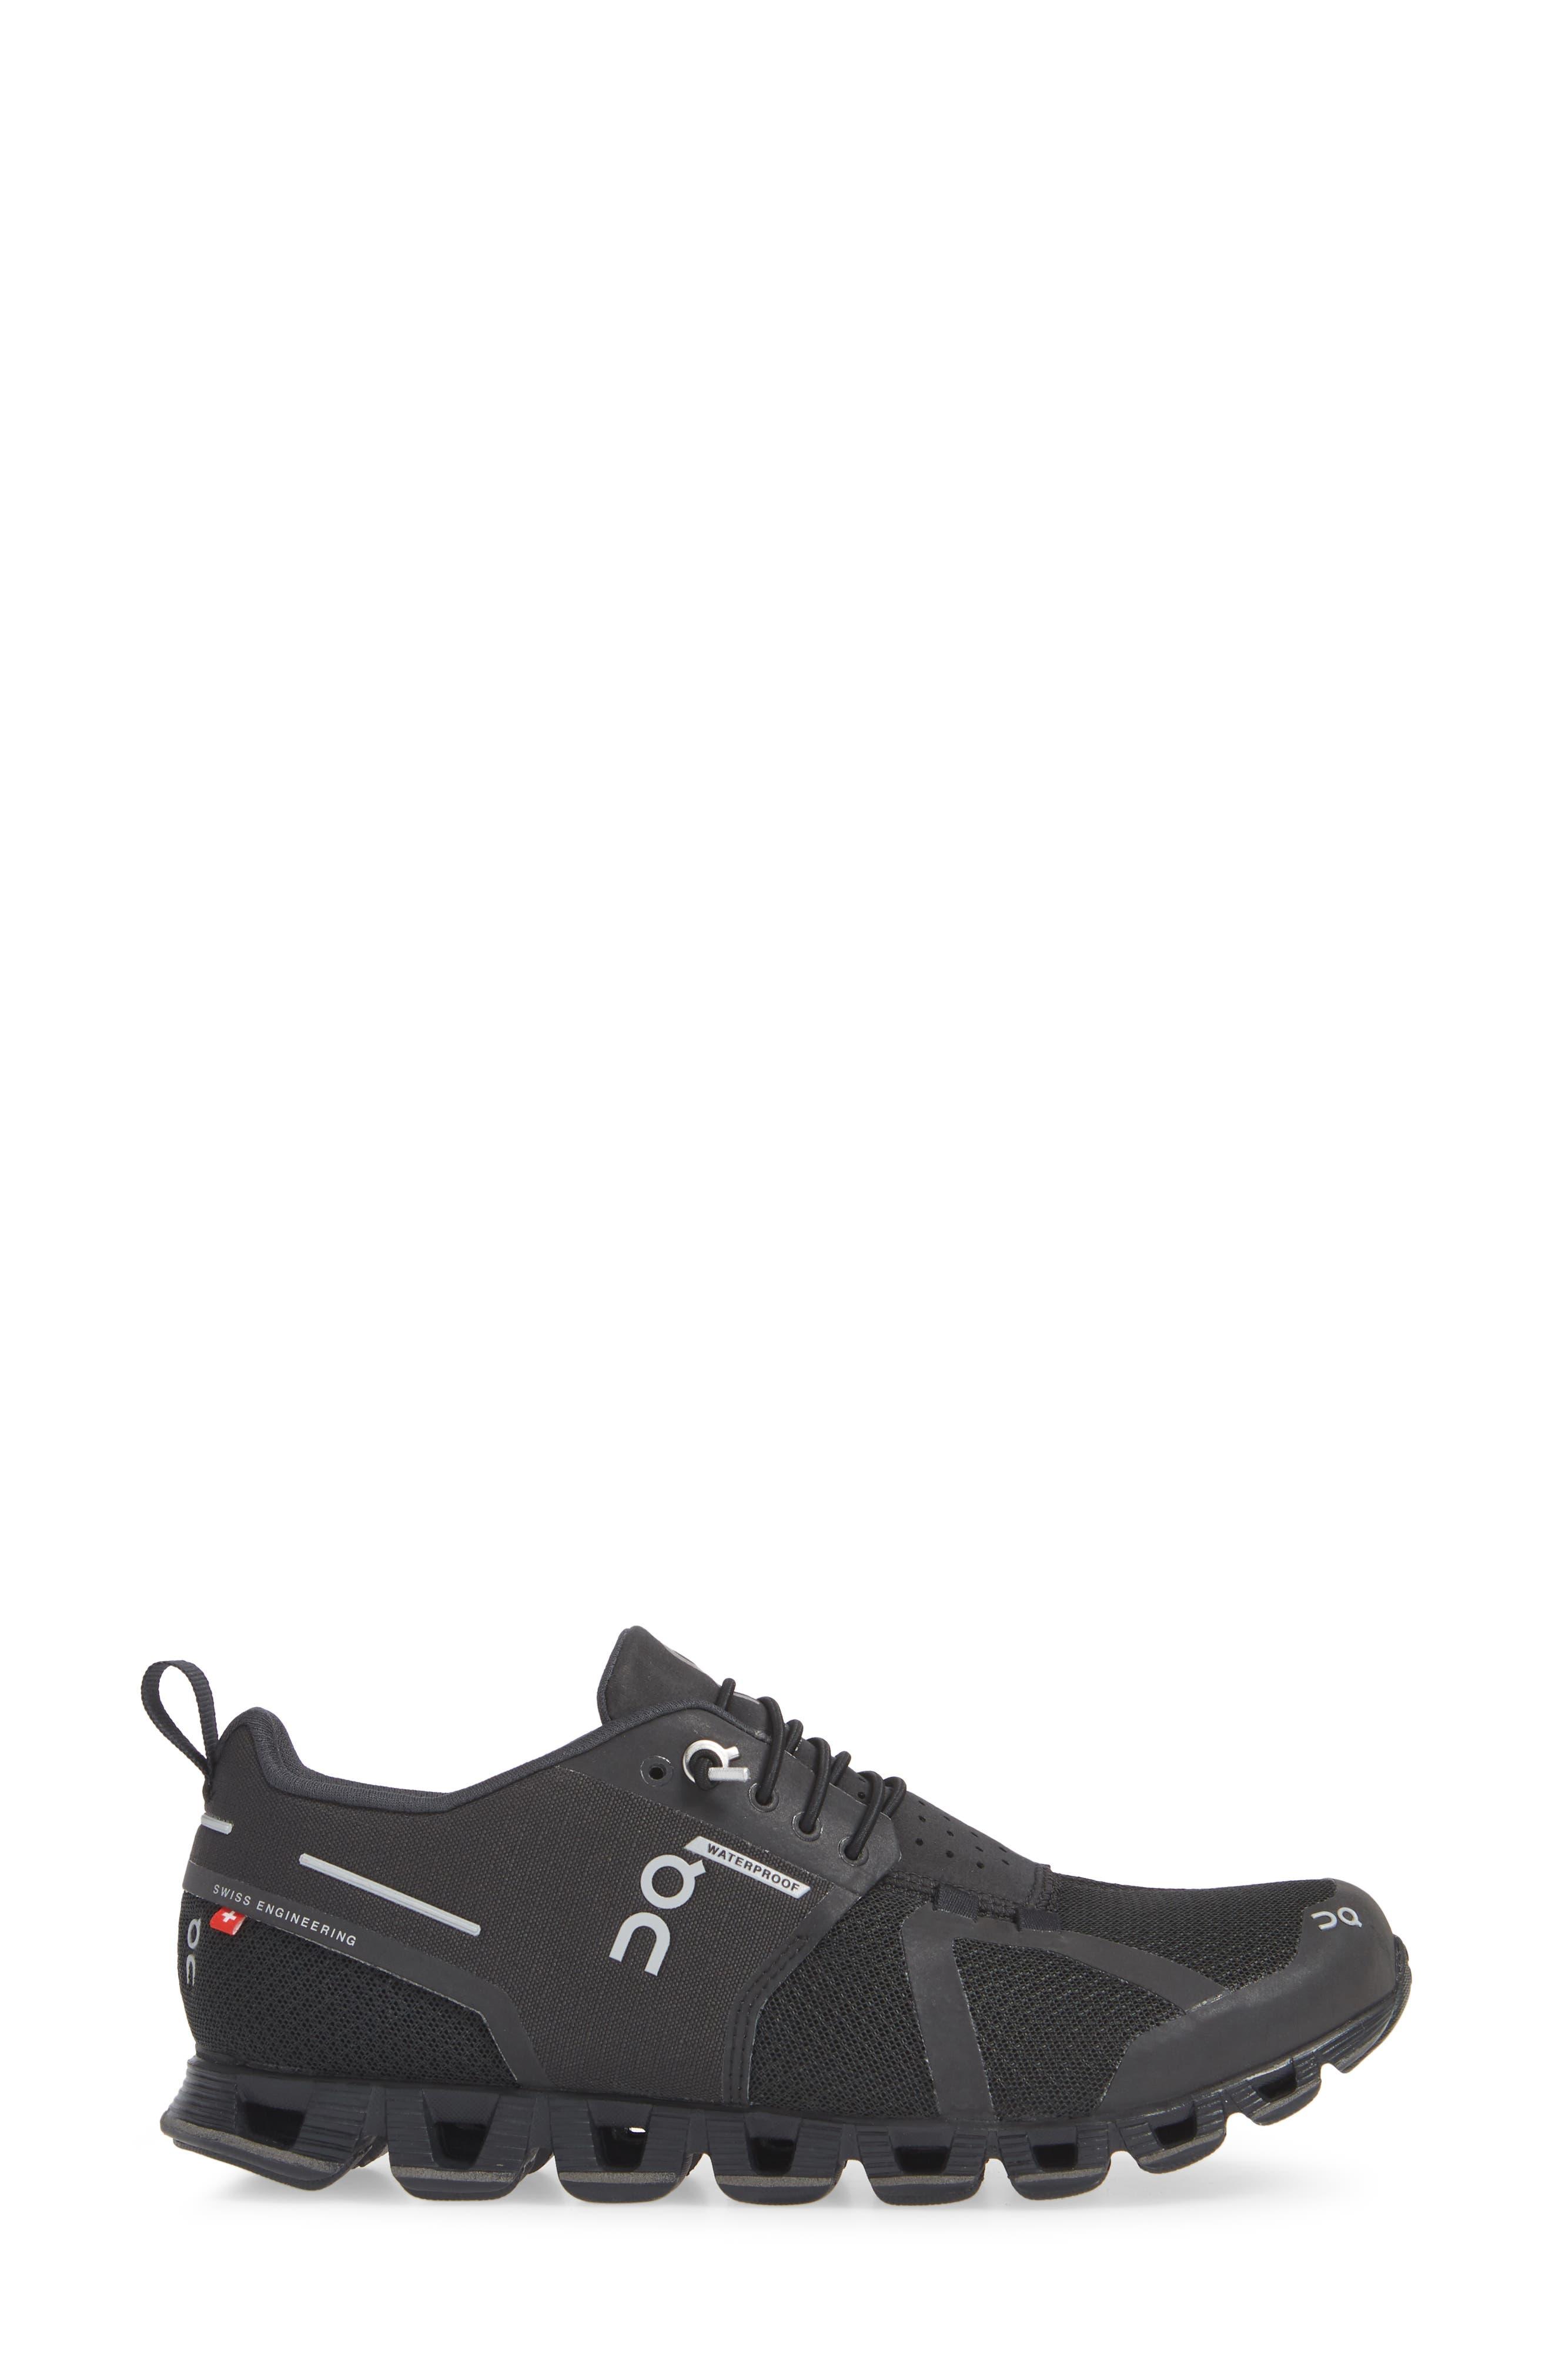 Cloud Waterproof Running Shoe,                             Alternate thumbnail 3, color,                             BLACK/ LUNAR